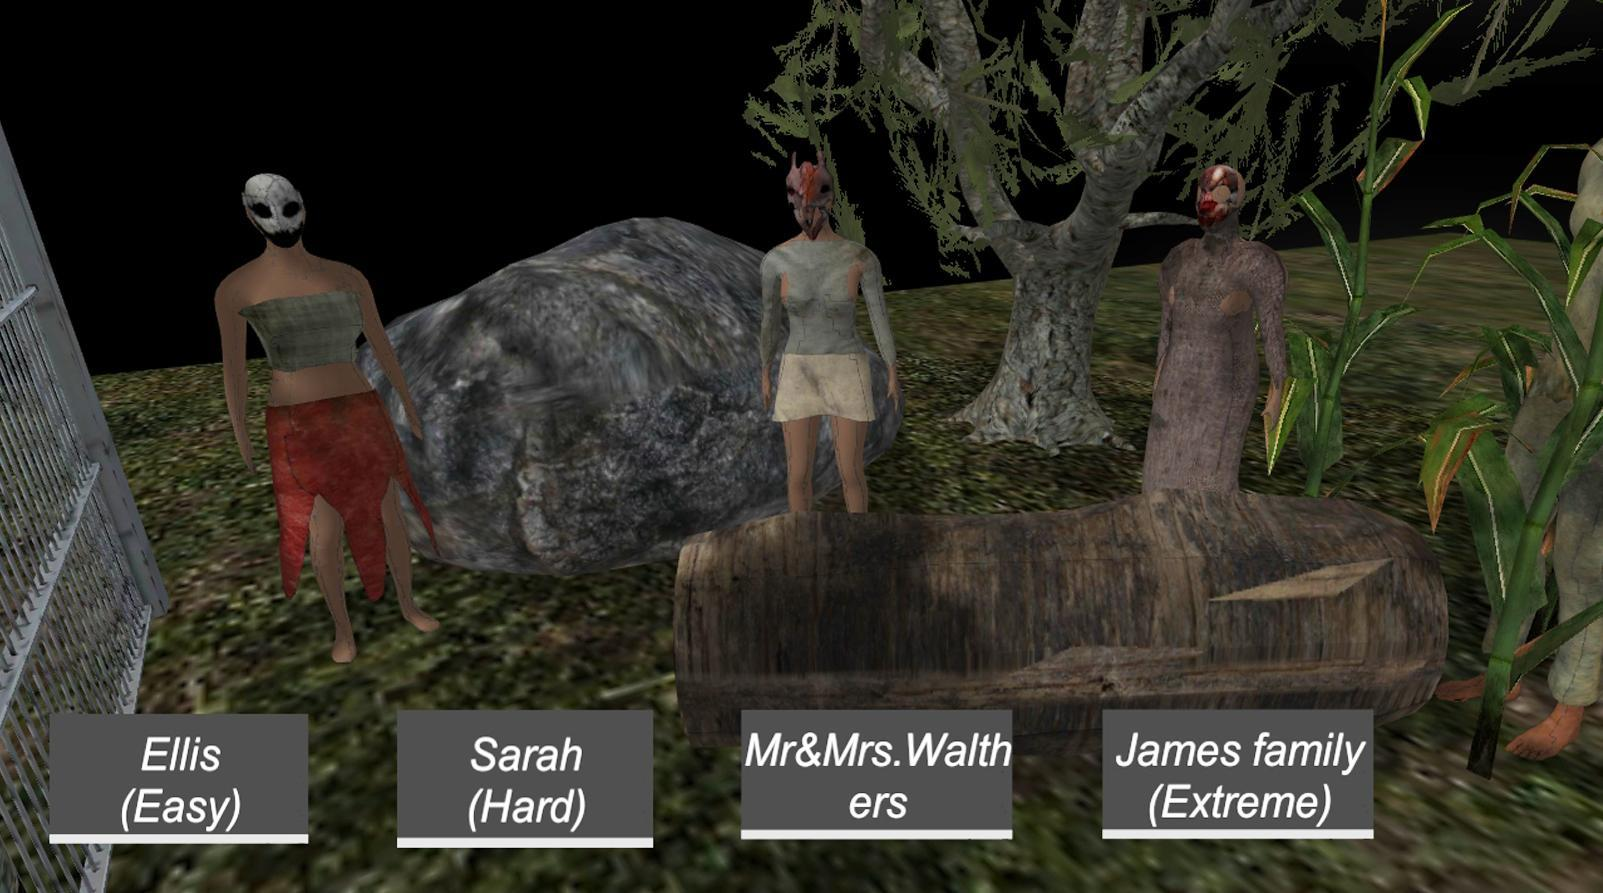 Family Creepy Scary Evil Scream Horror Game 1.6 Screenshot 1